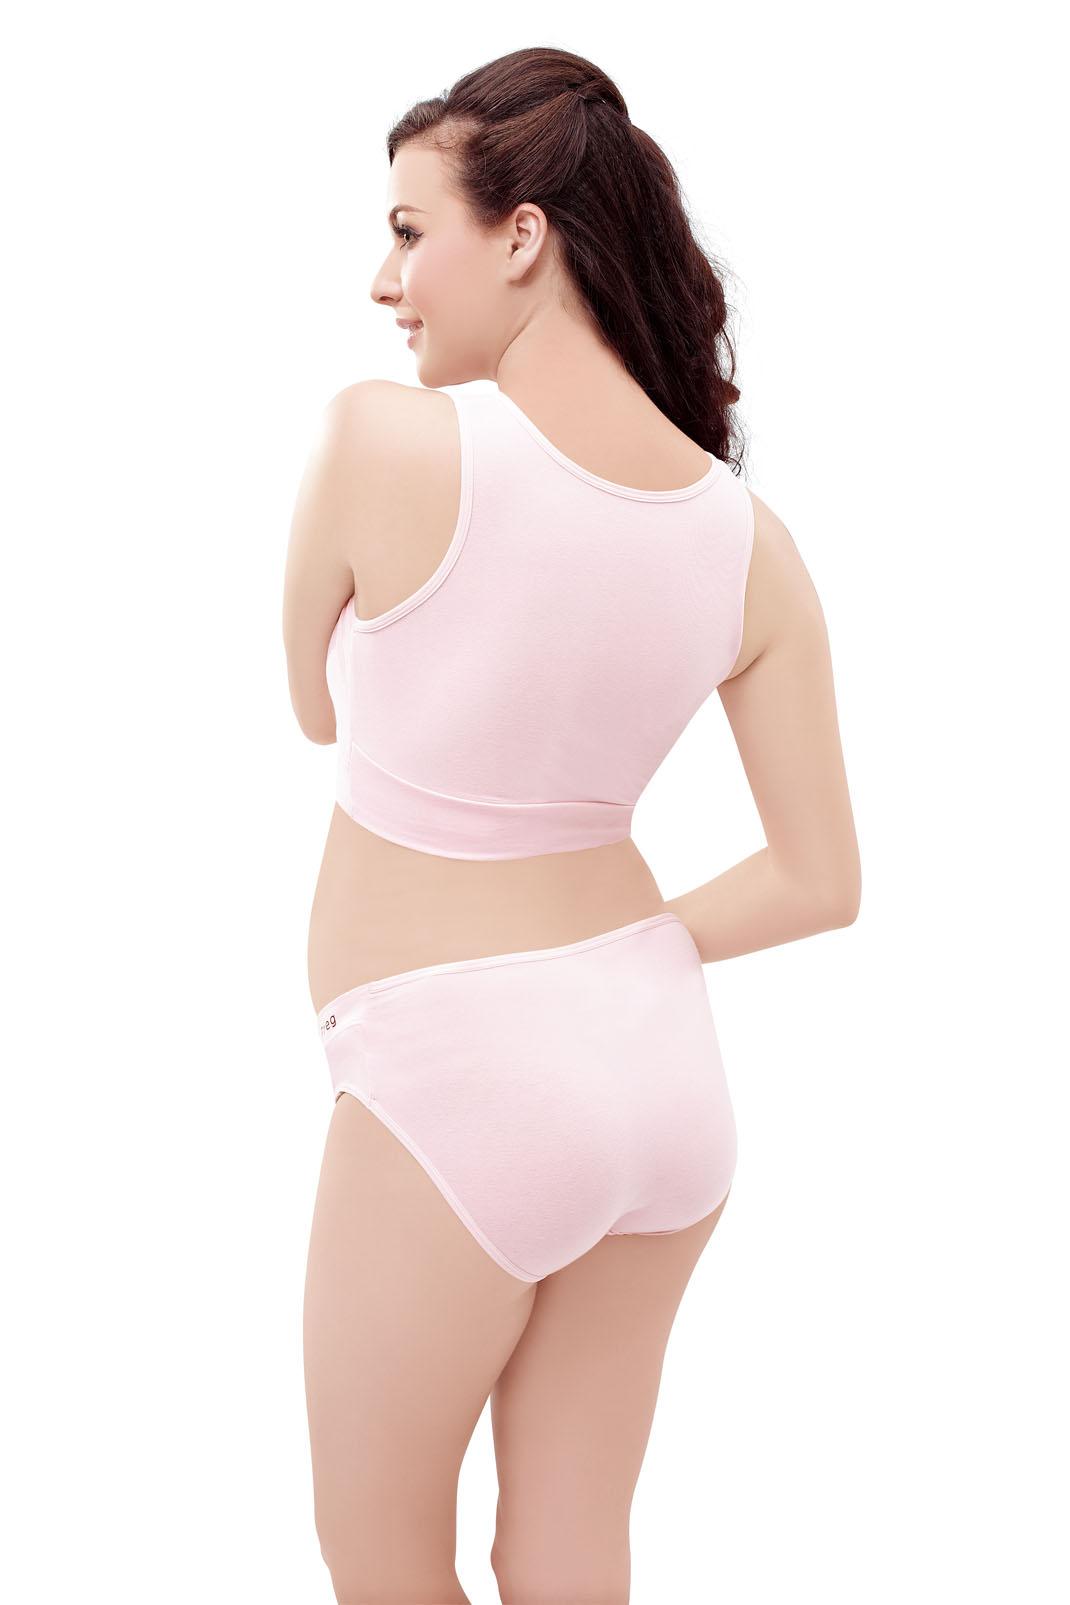 grade Pregnant Hipster Underwear Unique U Shaped ...